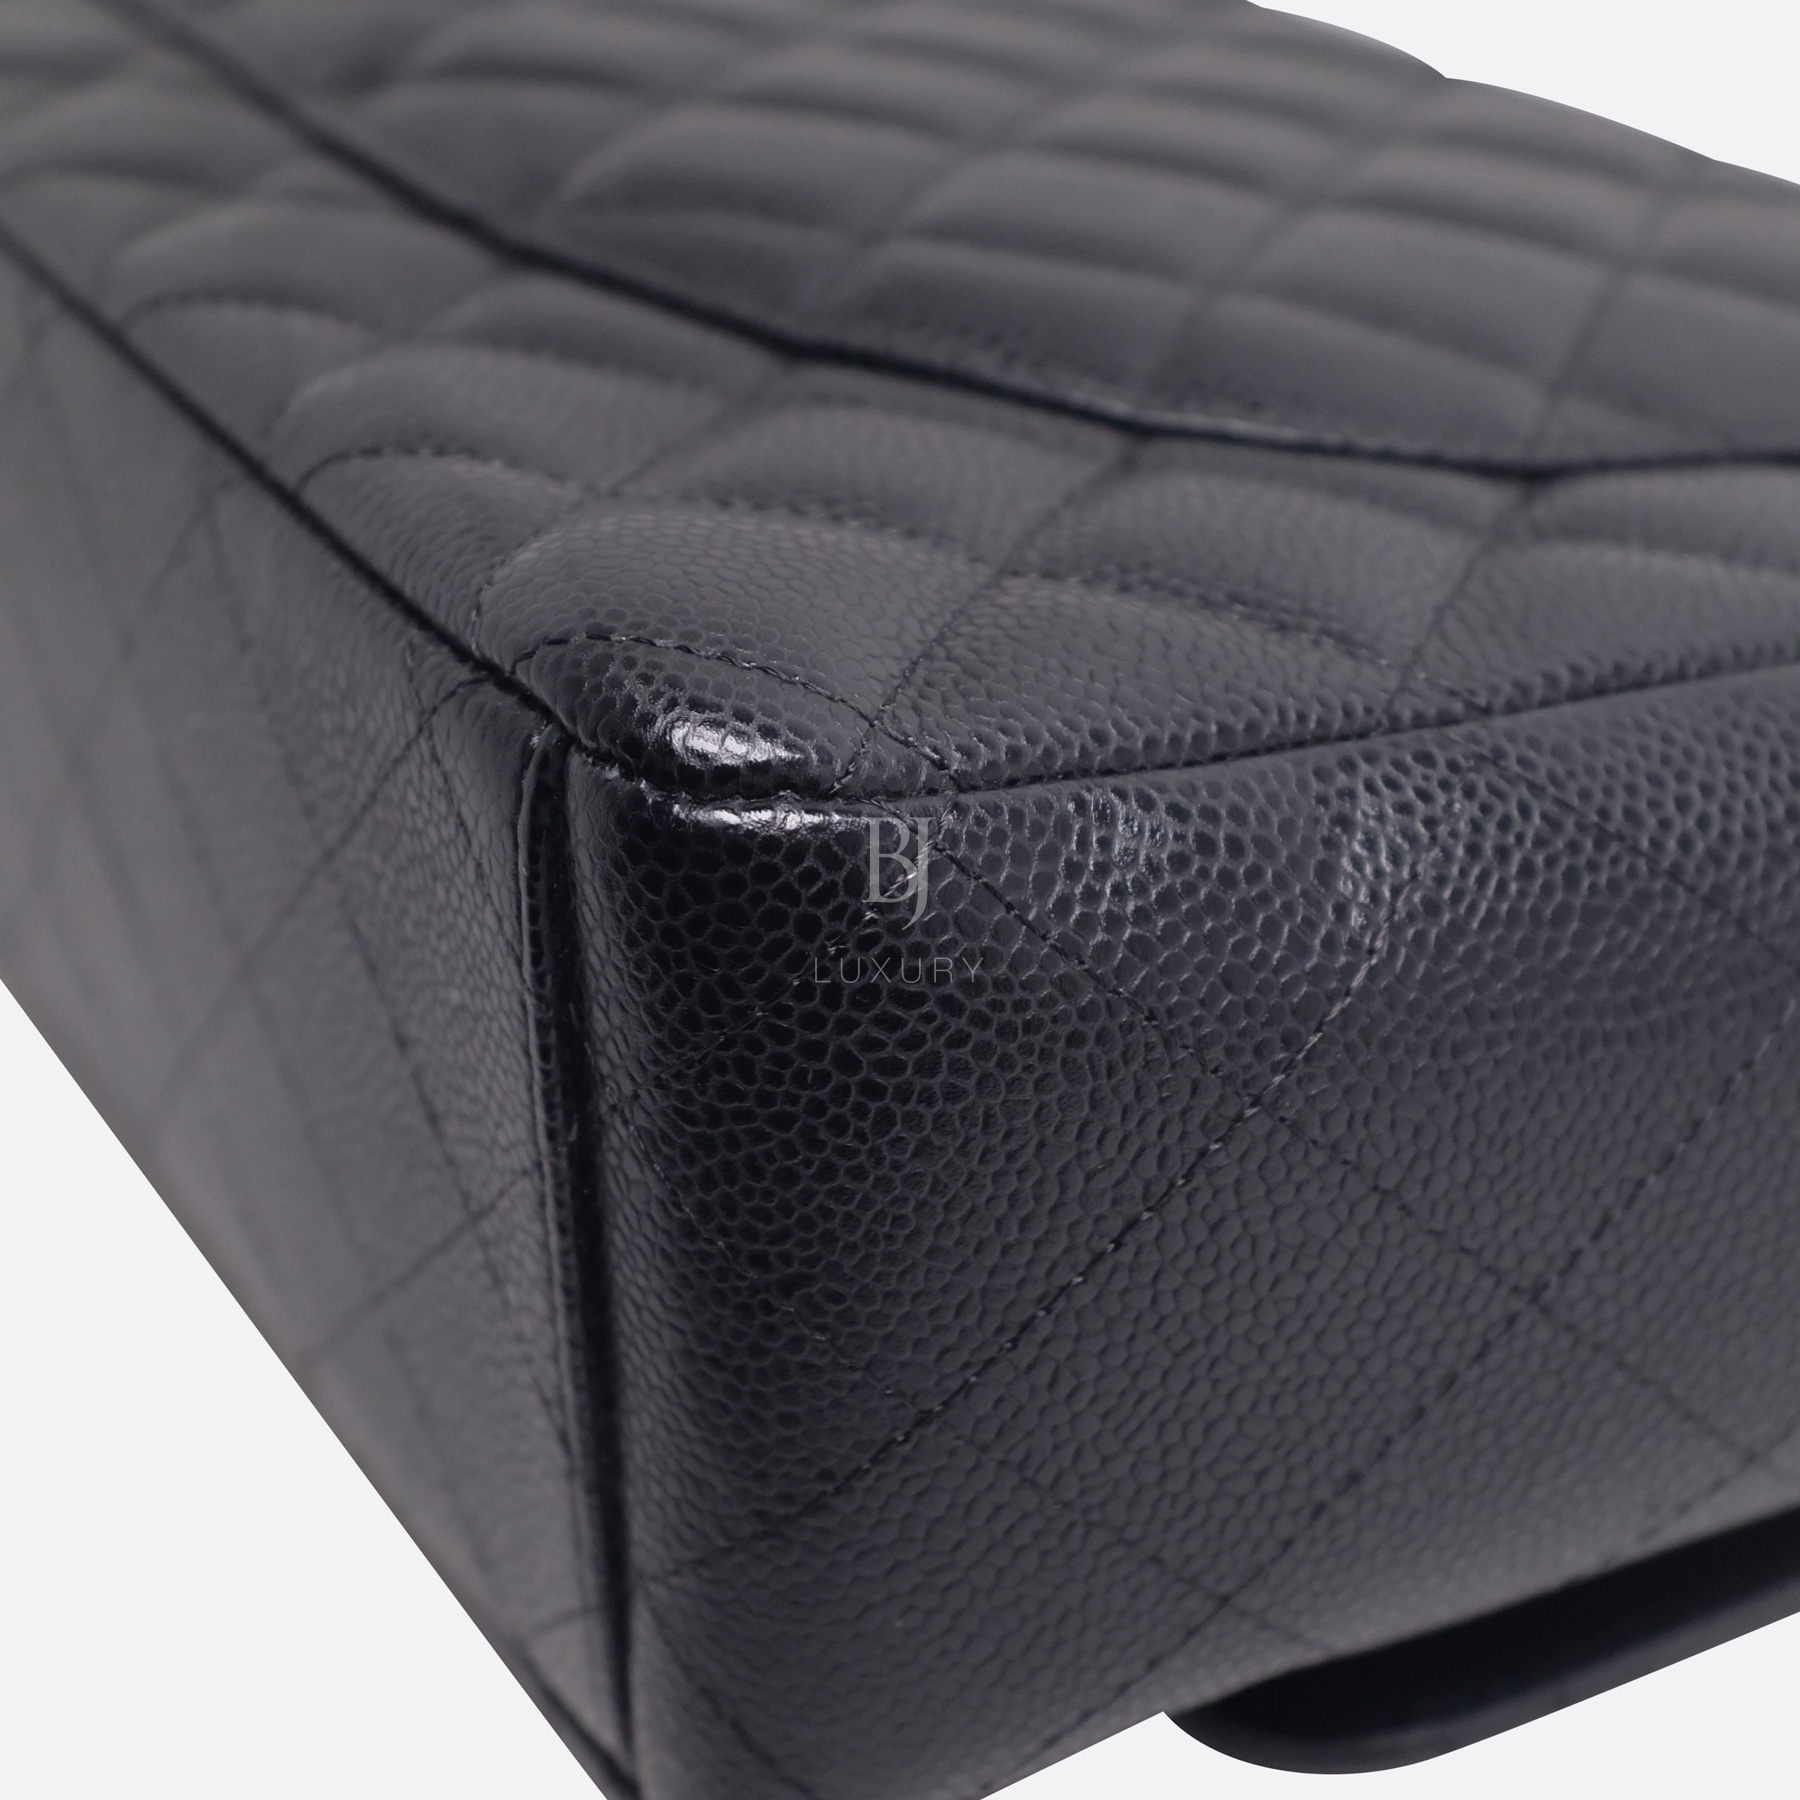 Chanel Classic Handbag Caviar Maxi Black BJ Luxury 10.jpg